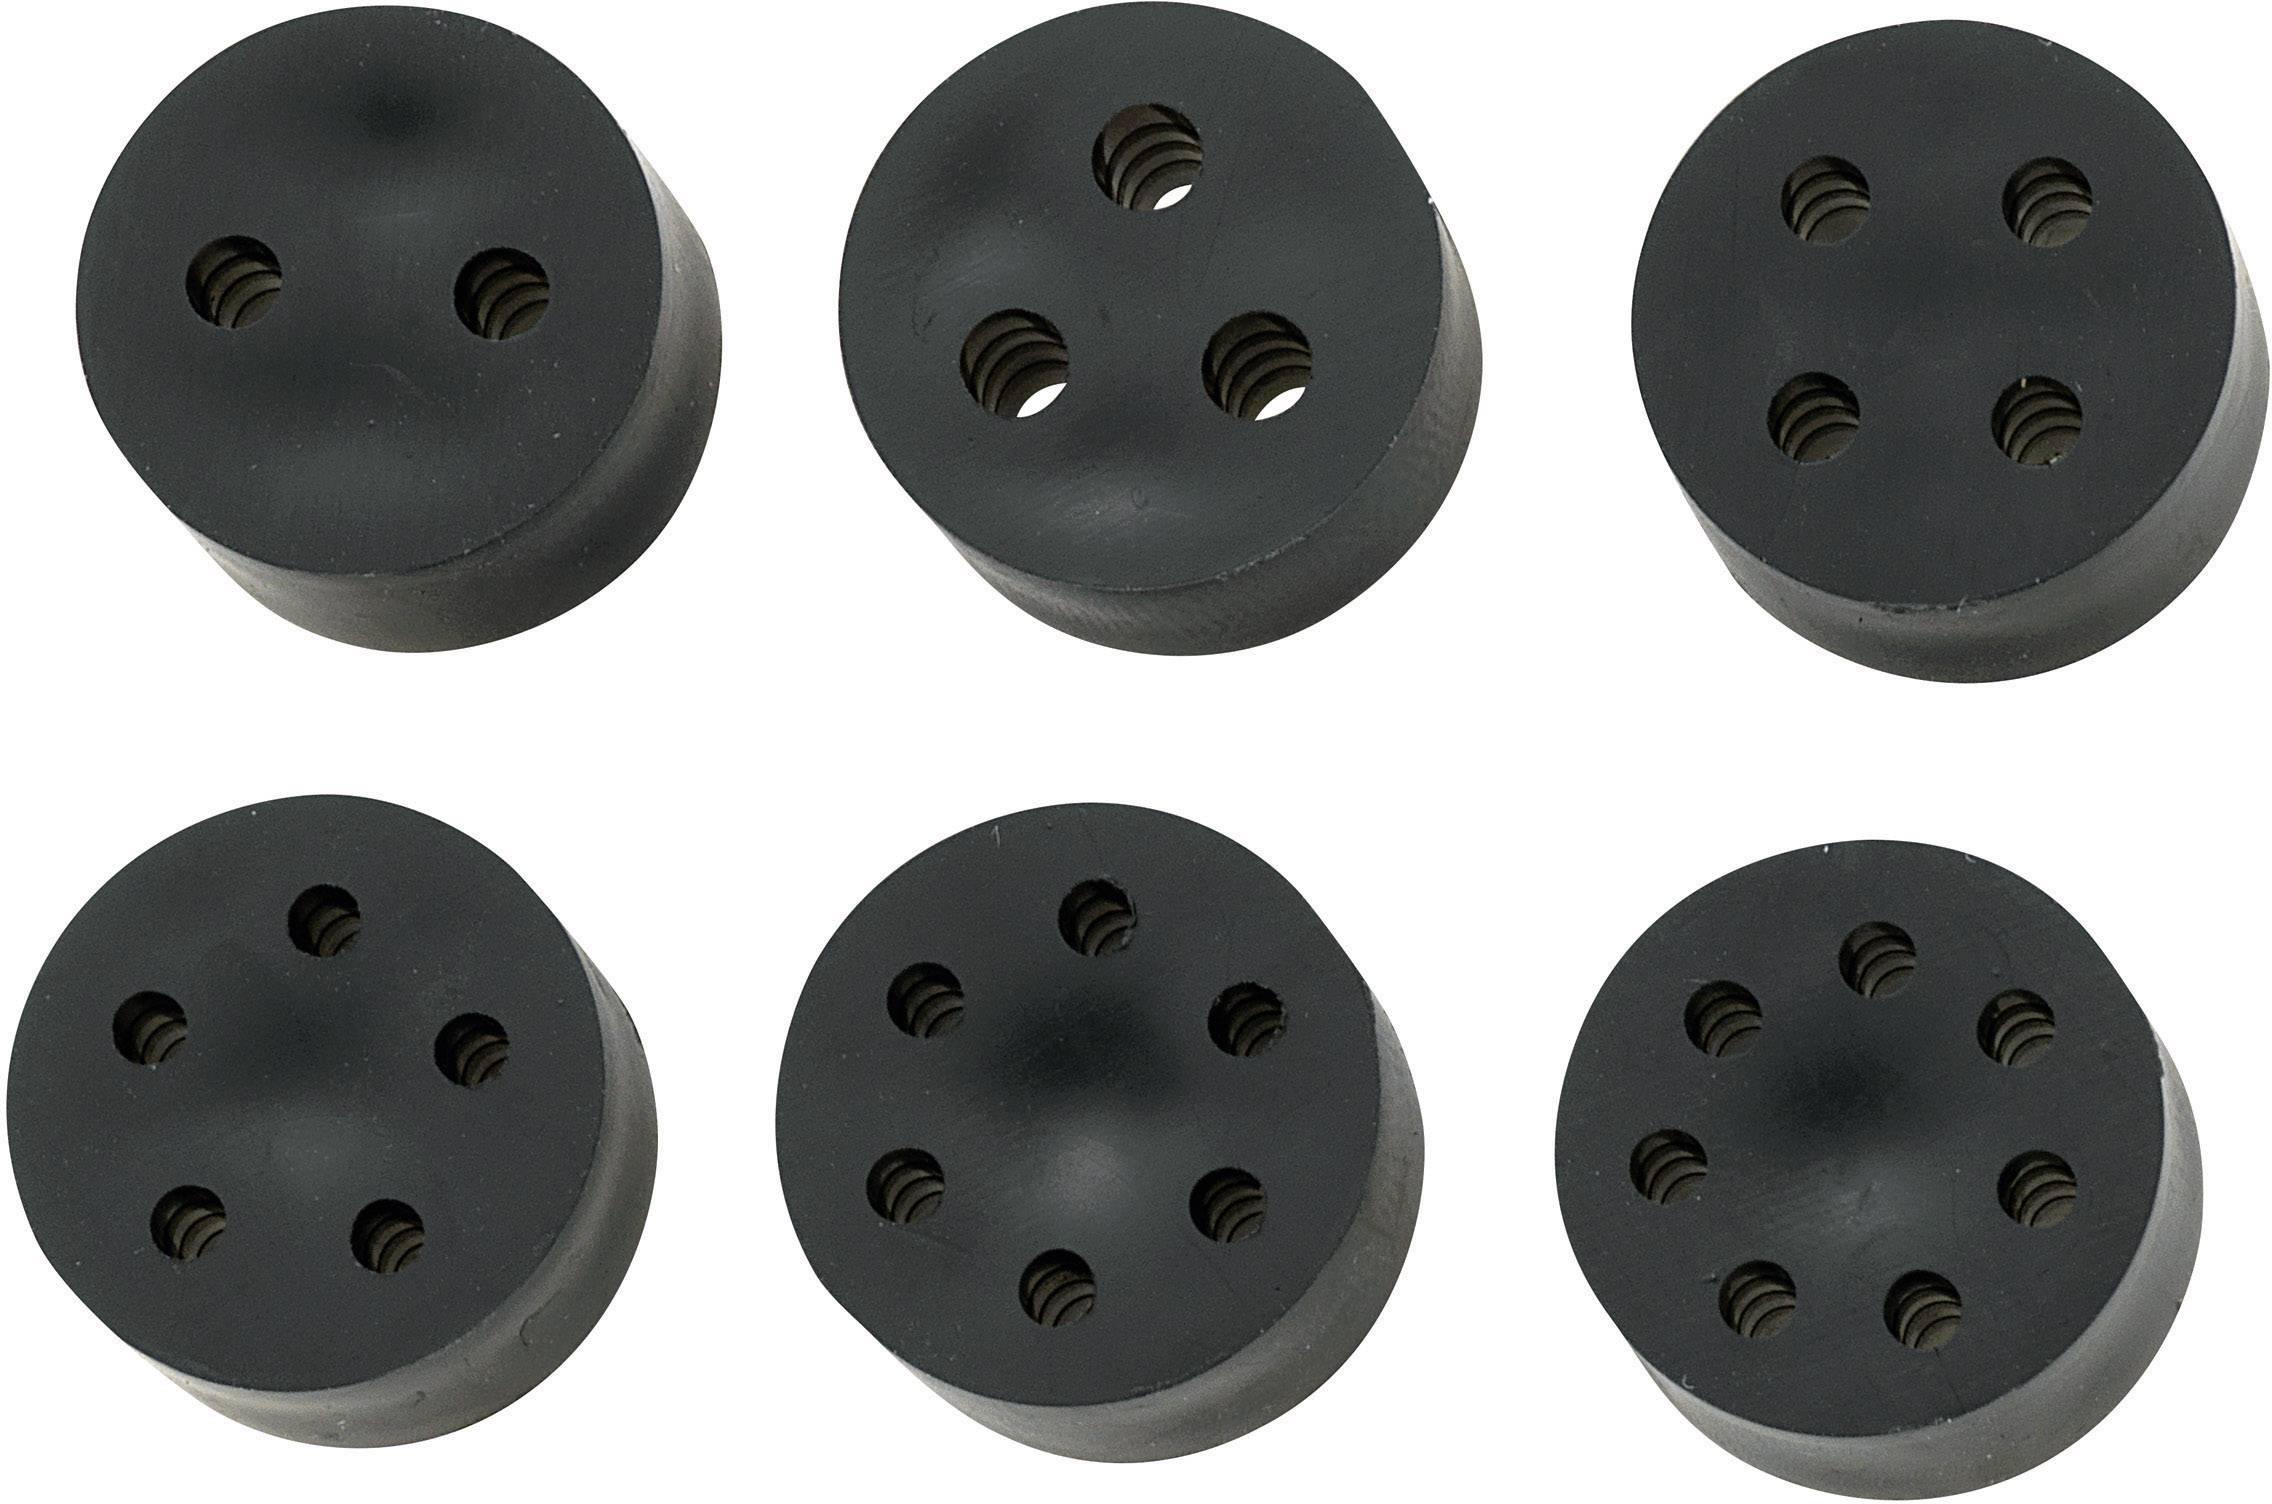 Těsnicí vložka M20 KSS AGRS207B (MH18-7B), IP68, M20, guma, černá